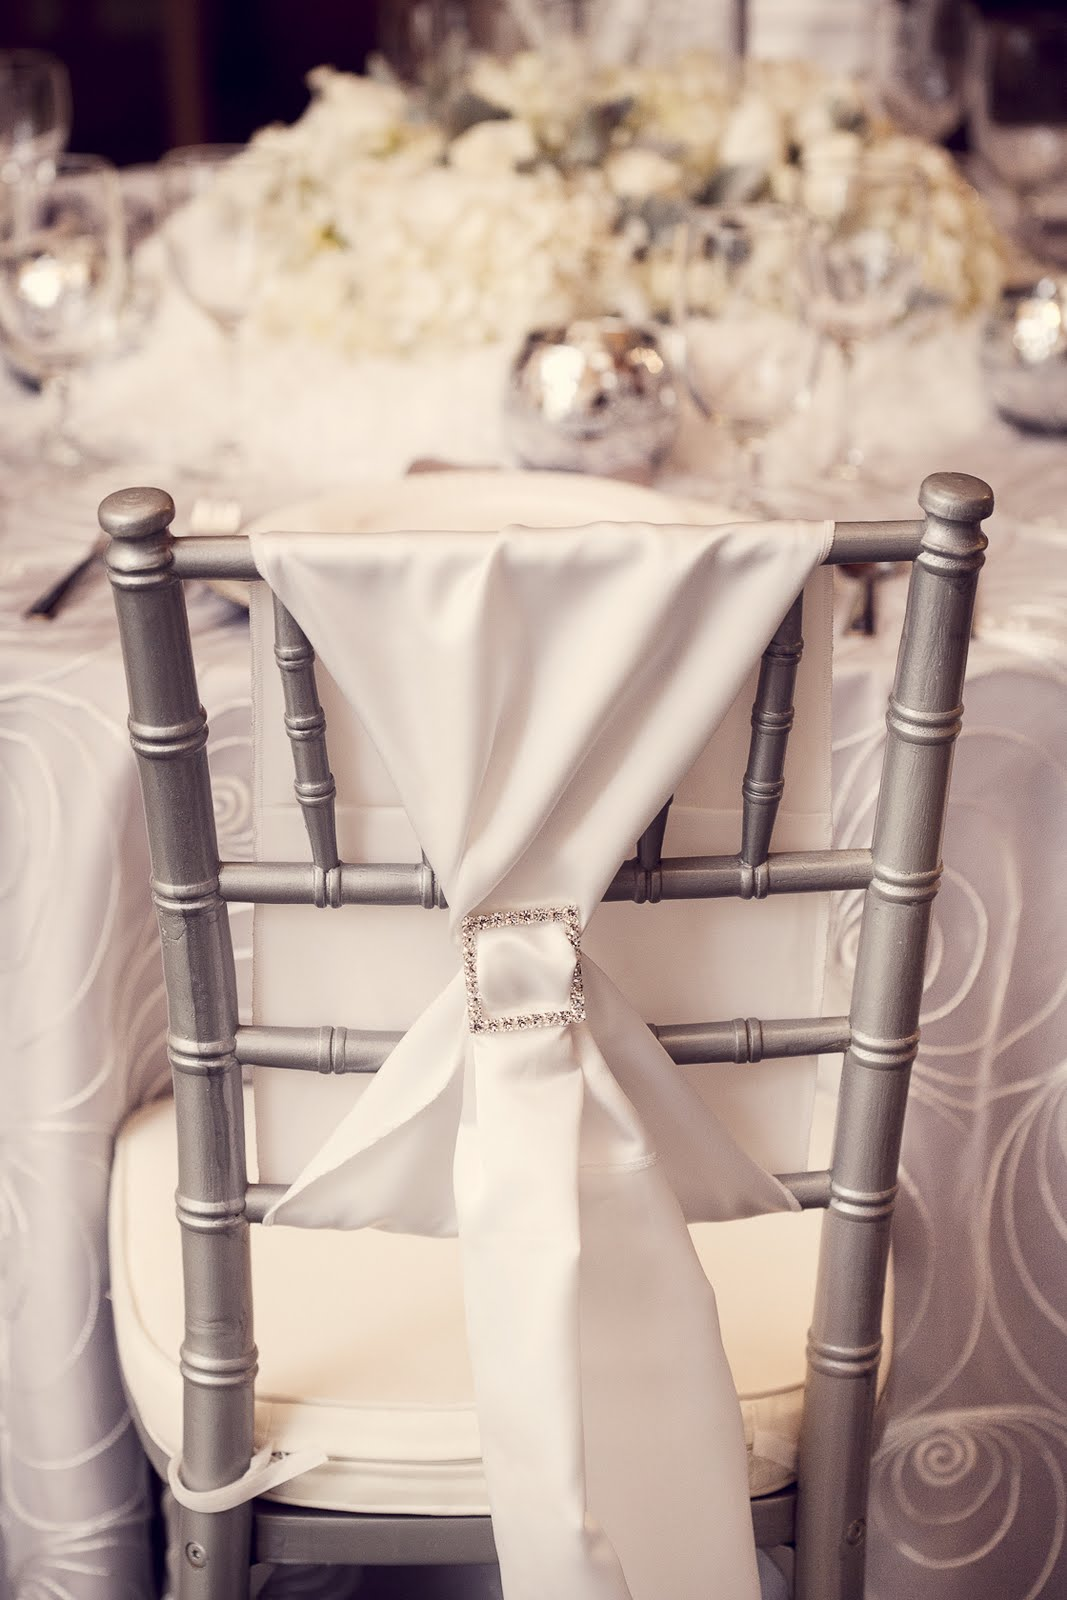 elegant chair covers for wedding miniature rocking arkansas bride magazine feature junkerman jones